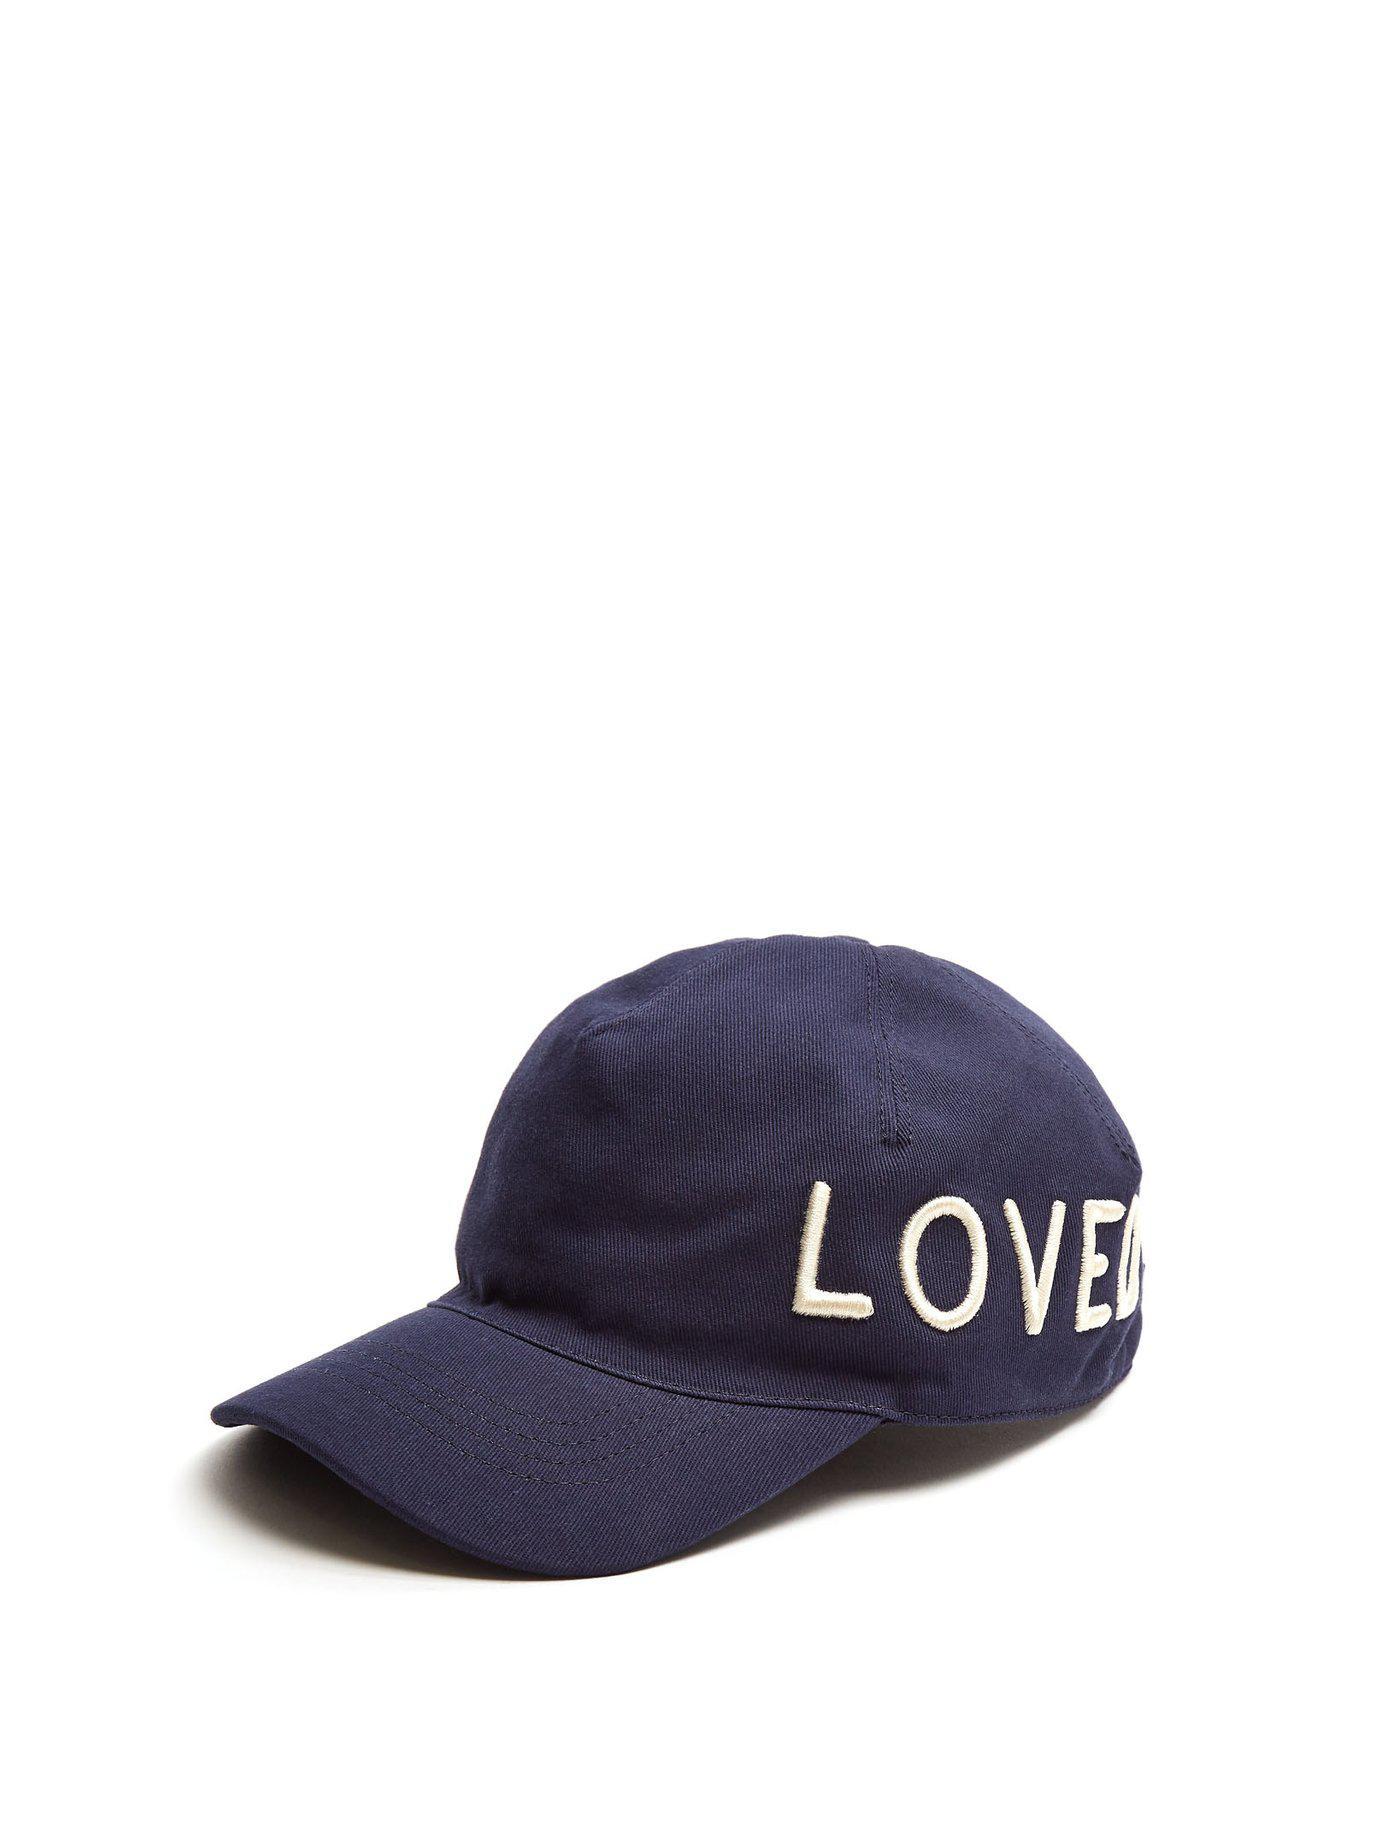 c63161e3fdf Lyst - Gucci Logo Embroidered Cotton Cap in Blue for Men